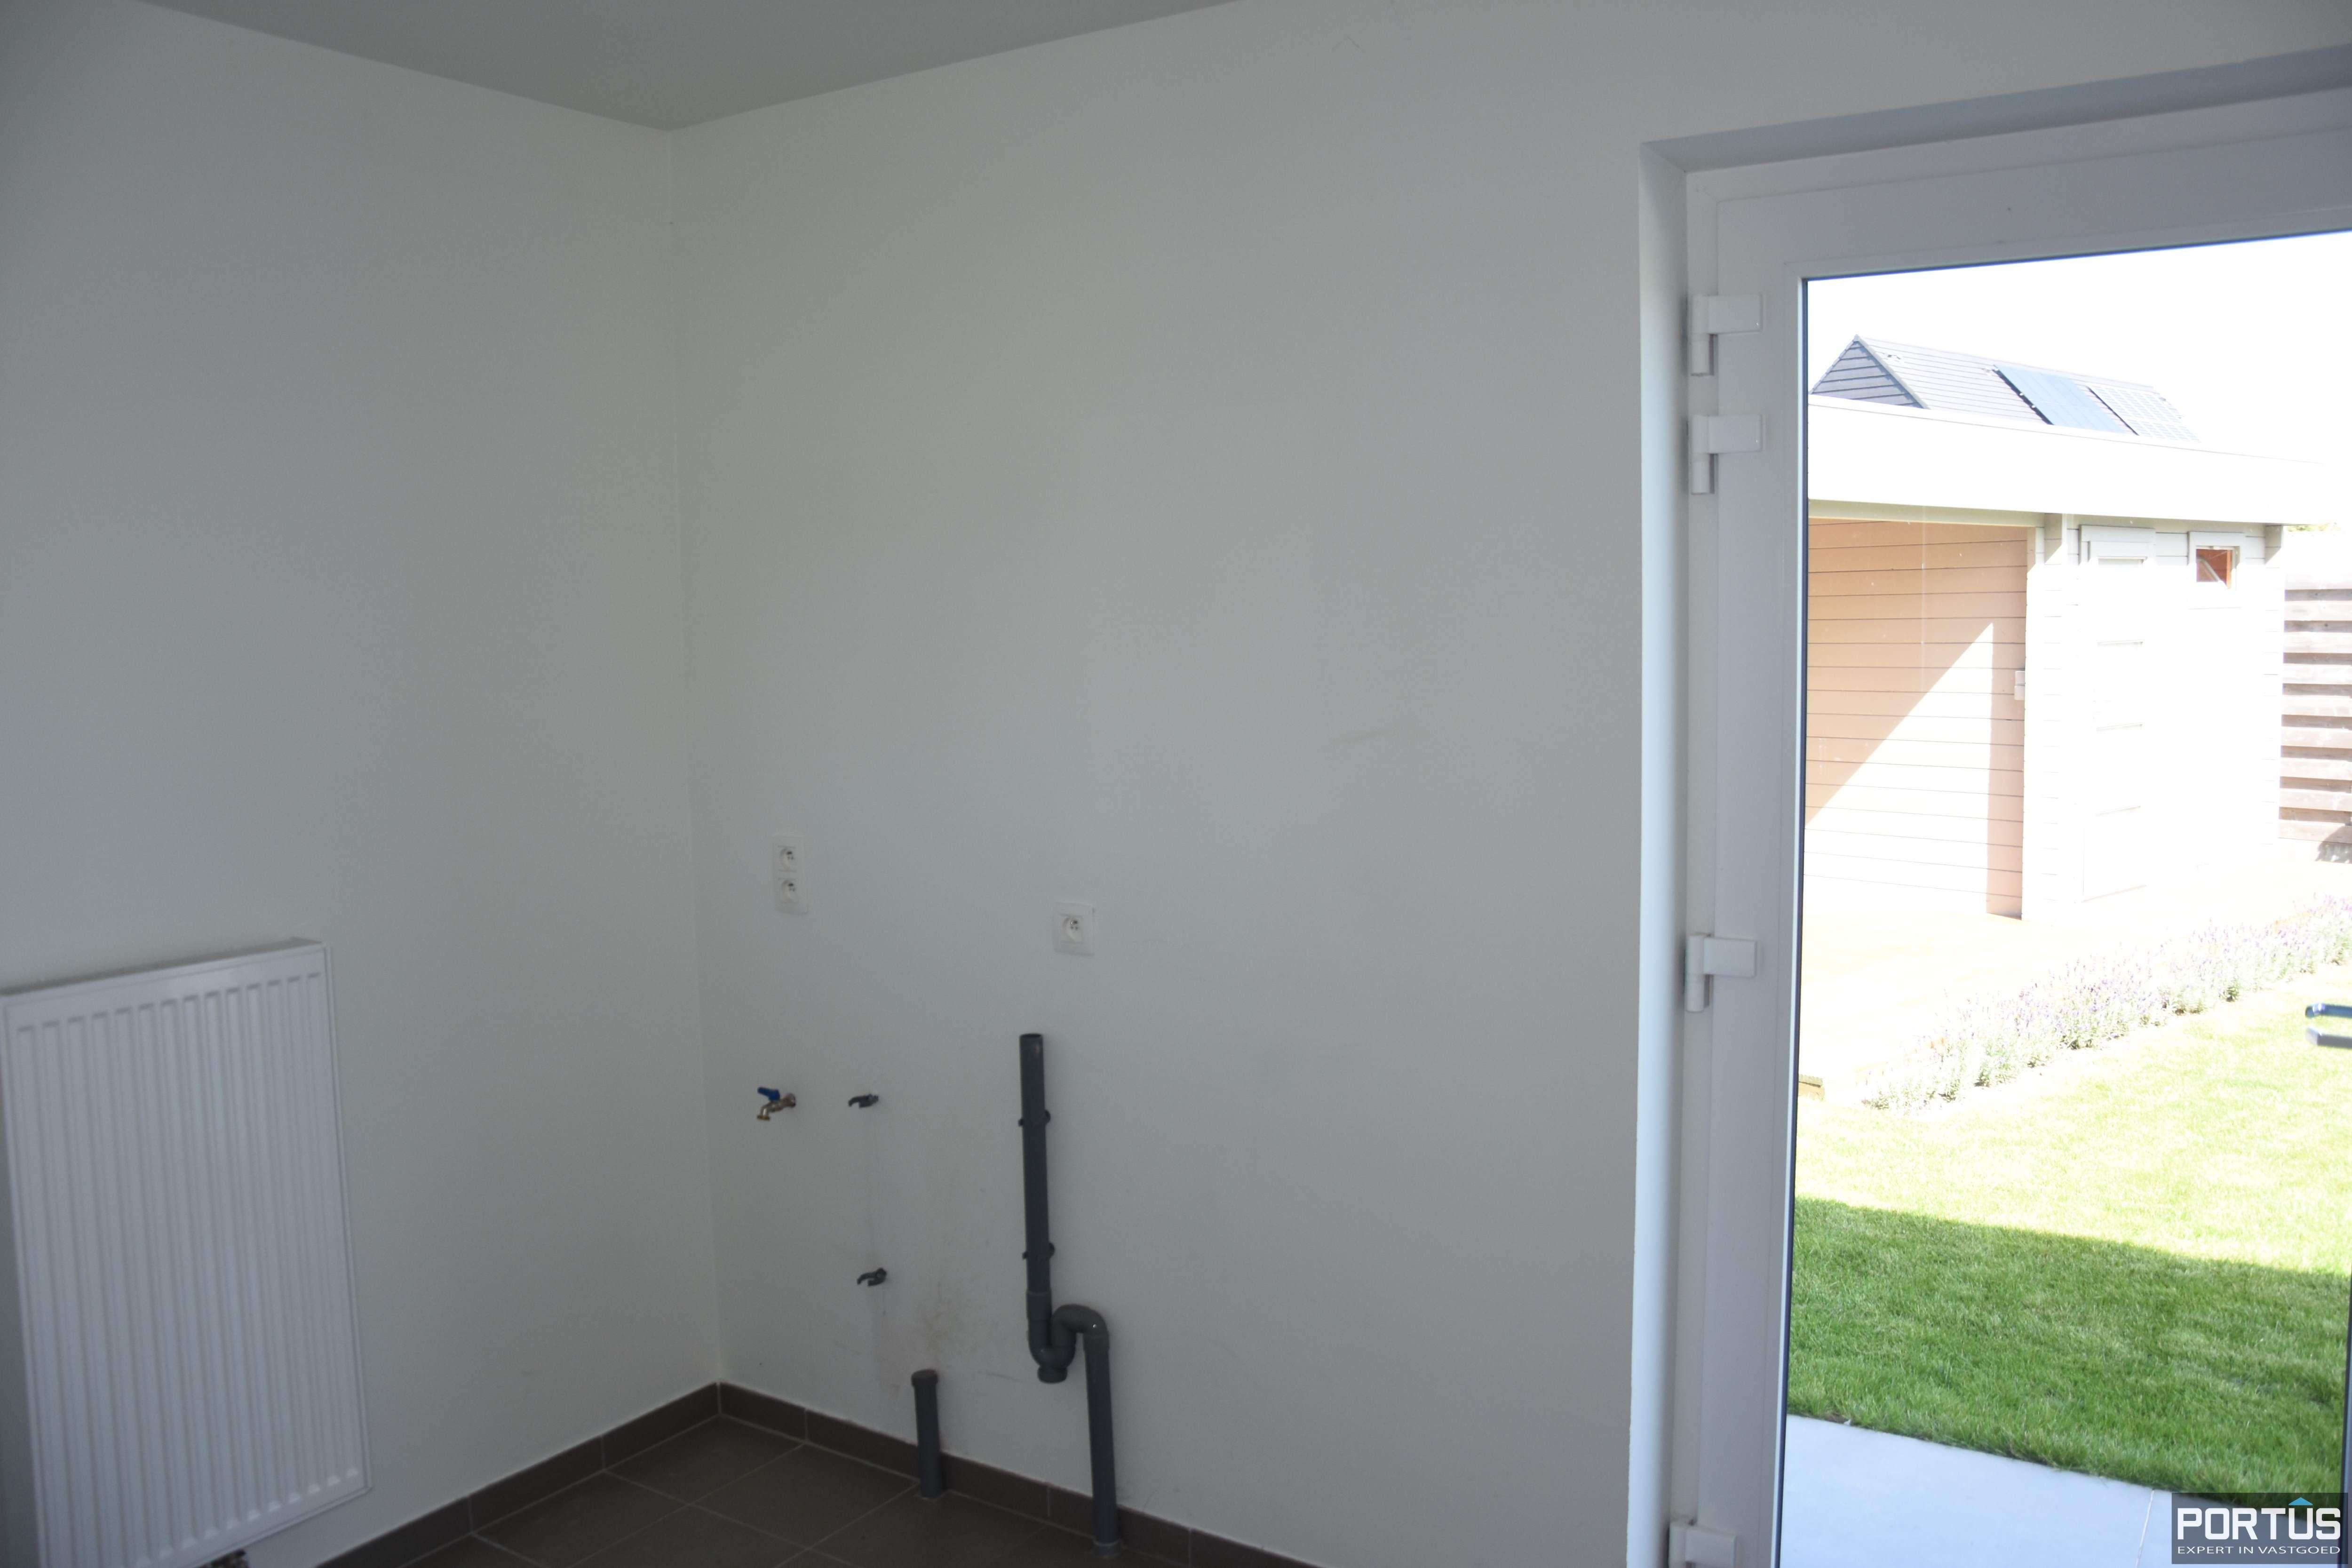 Recente villa te huur met 4 slaapkamers te Westende - 11234